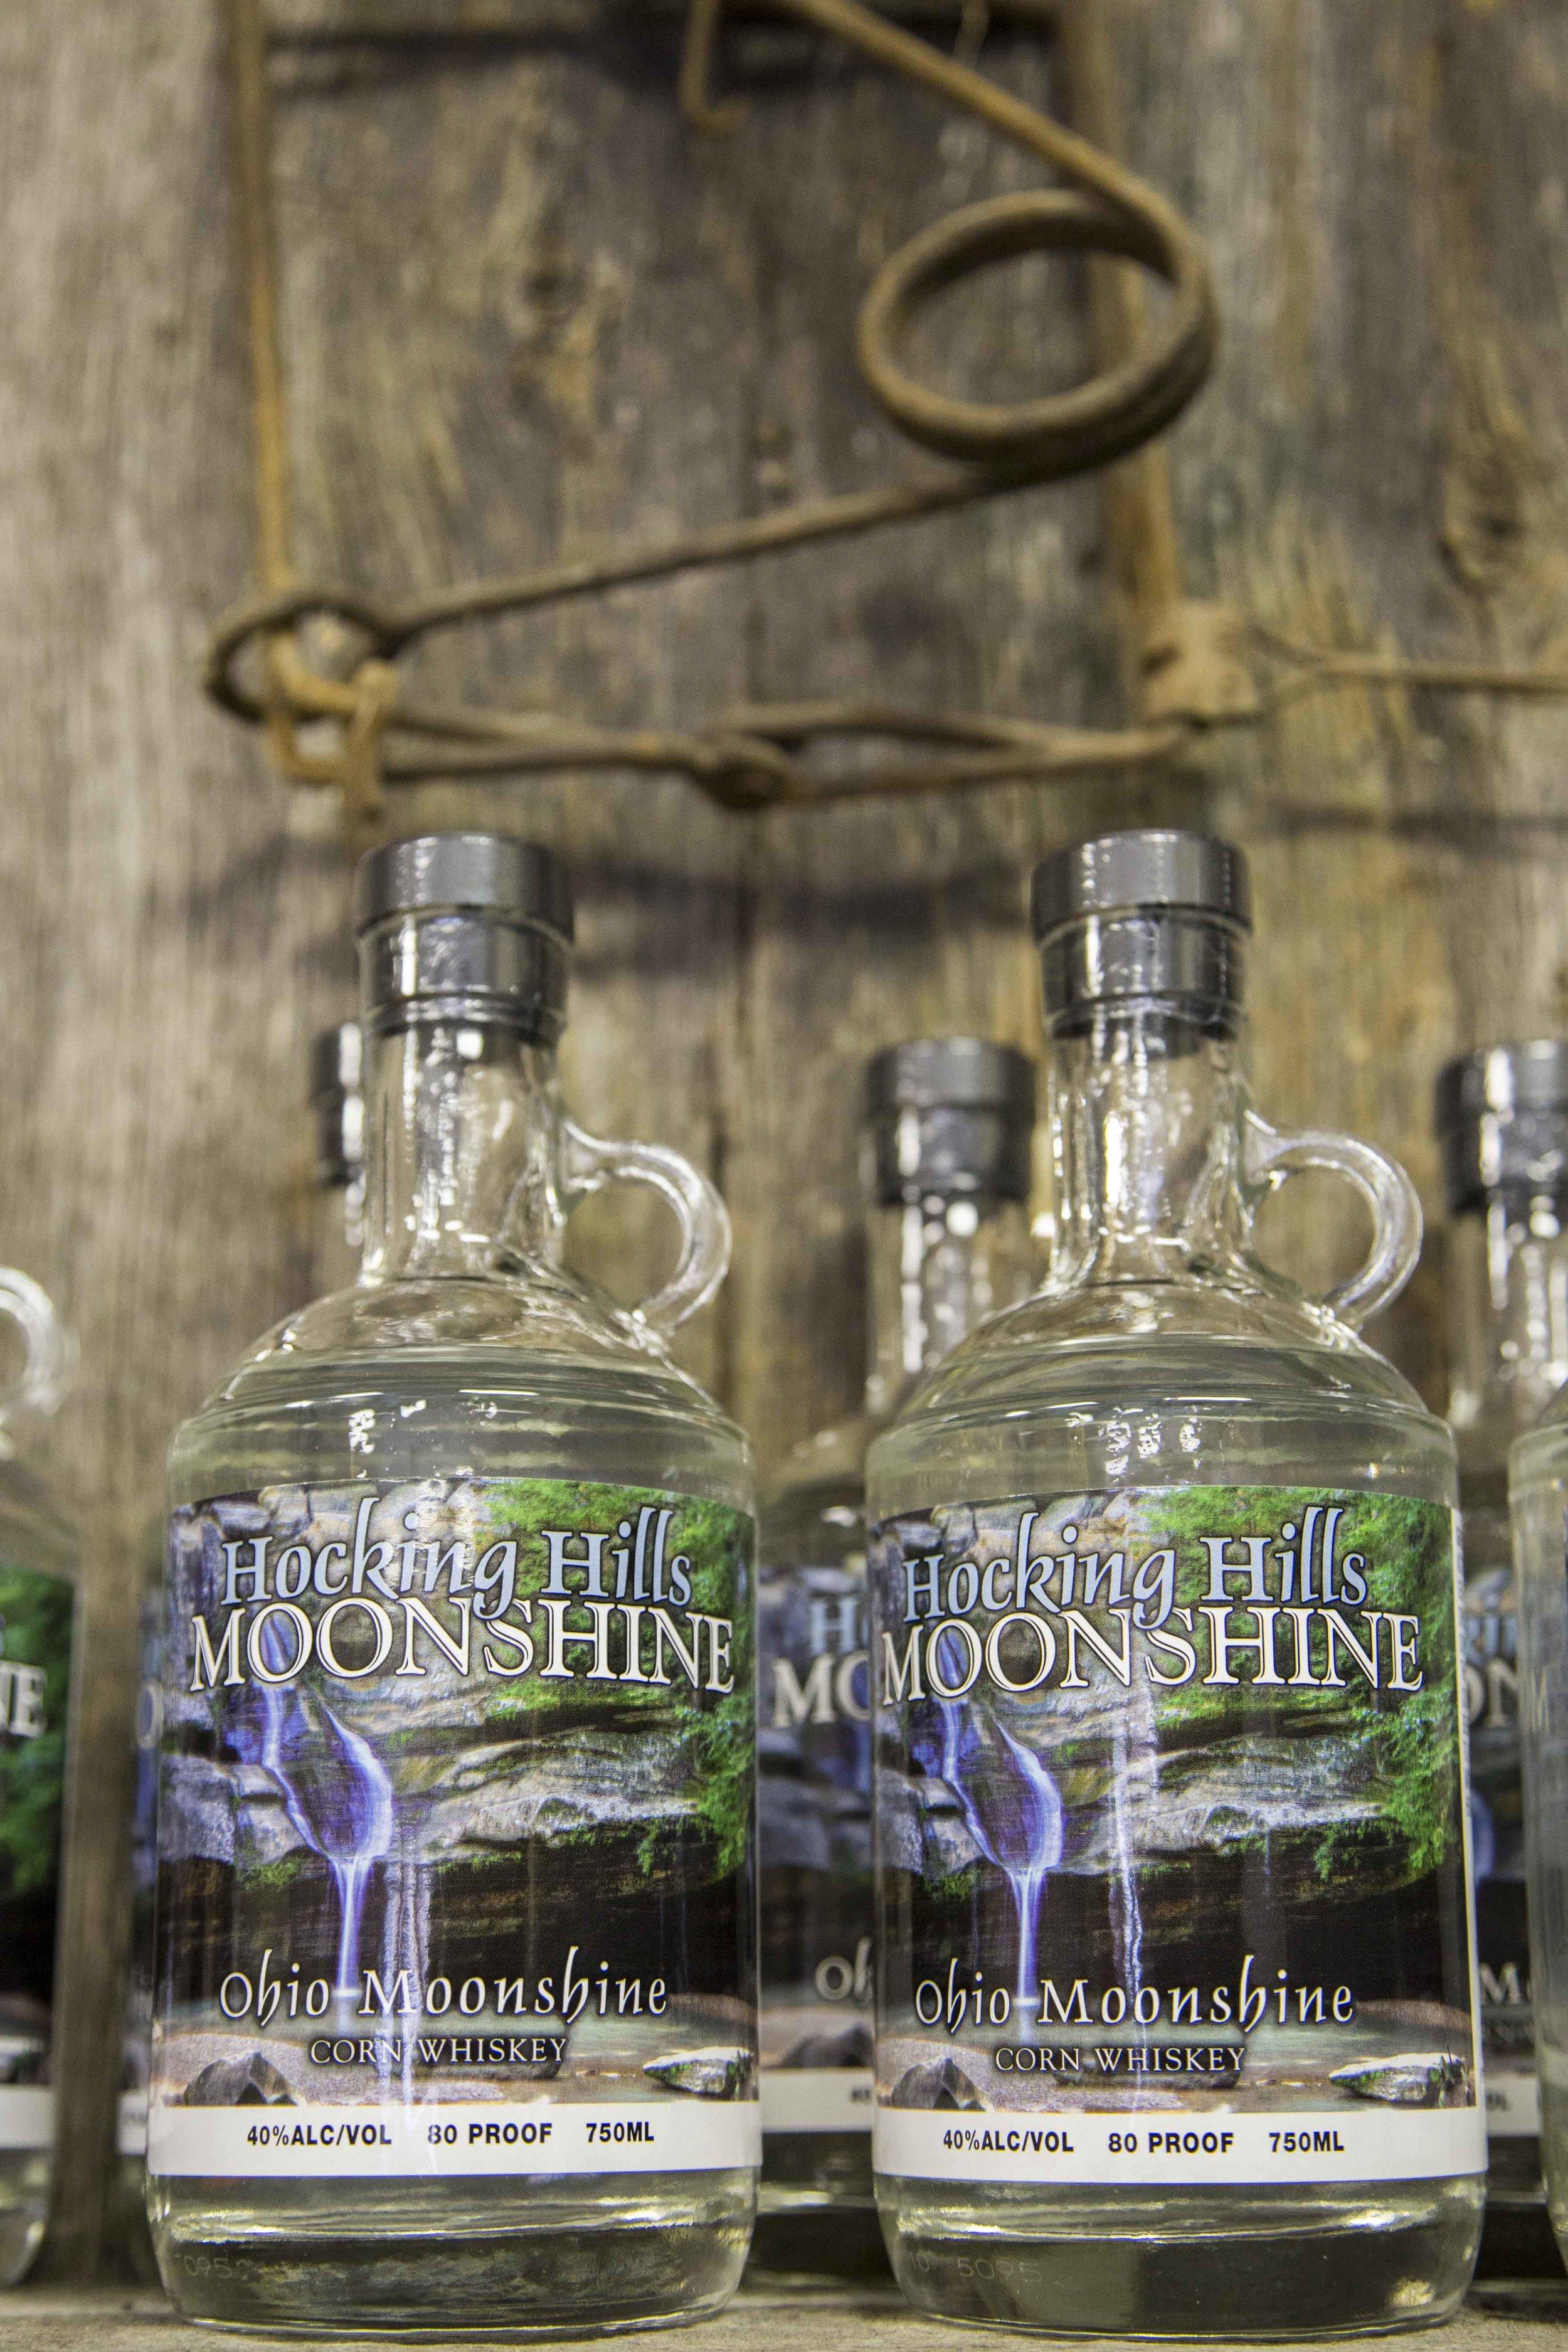 Todd_Sechel_Oct162015_1768 HH_Moonshine.jpg